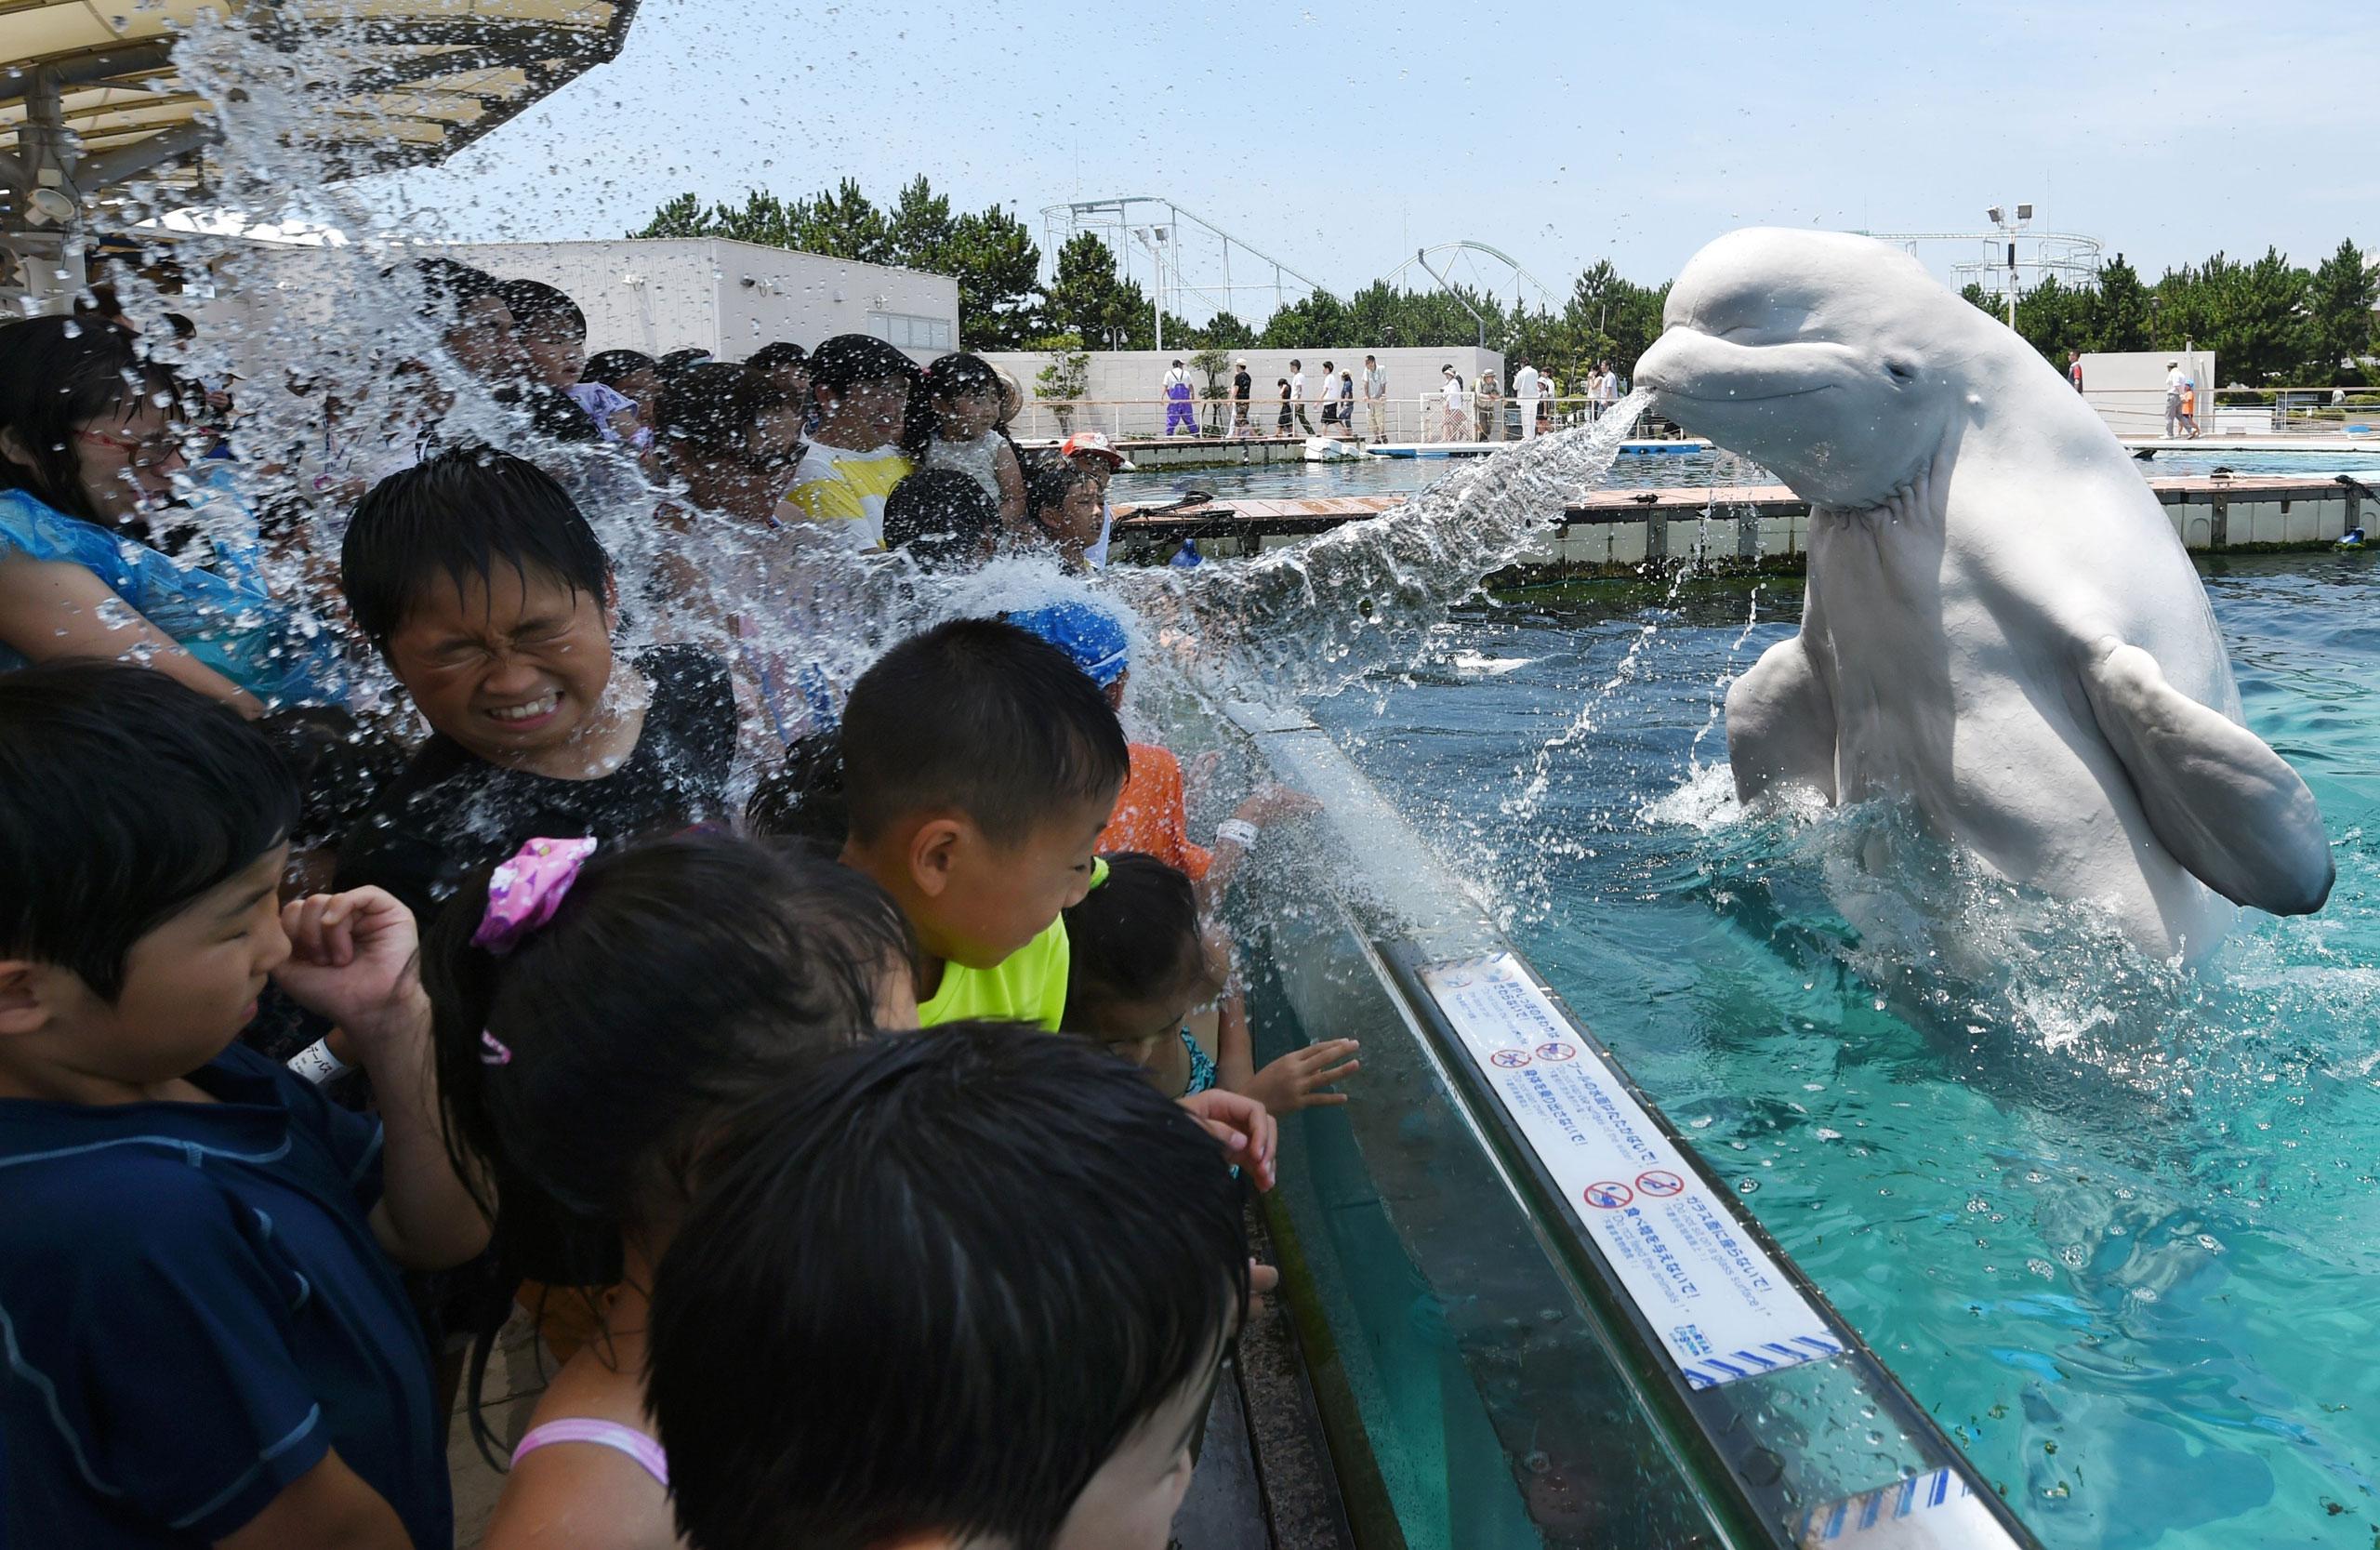 A beluga whale sprays water towards visitors during a summer attraction at the Hakkeijima Sea Paradise aquarium in Yokohama, suburban Tokyo, Japan, July 20, 2015.